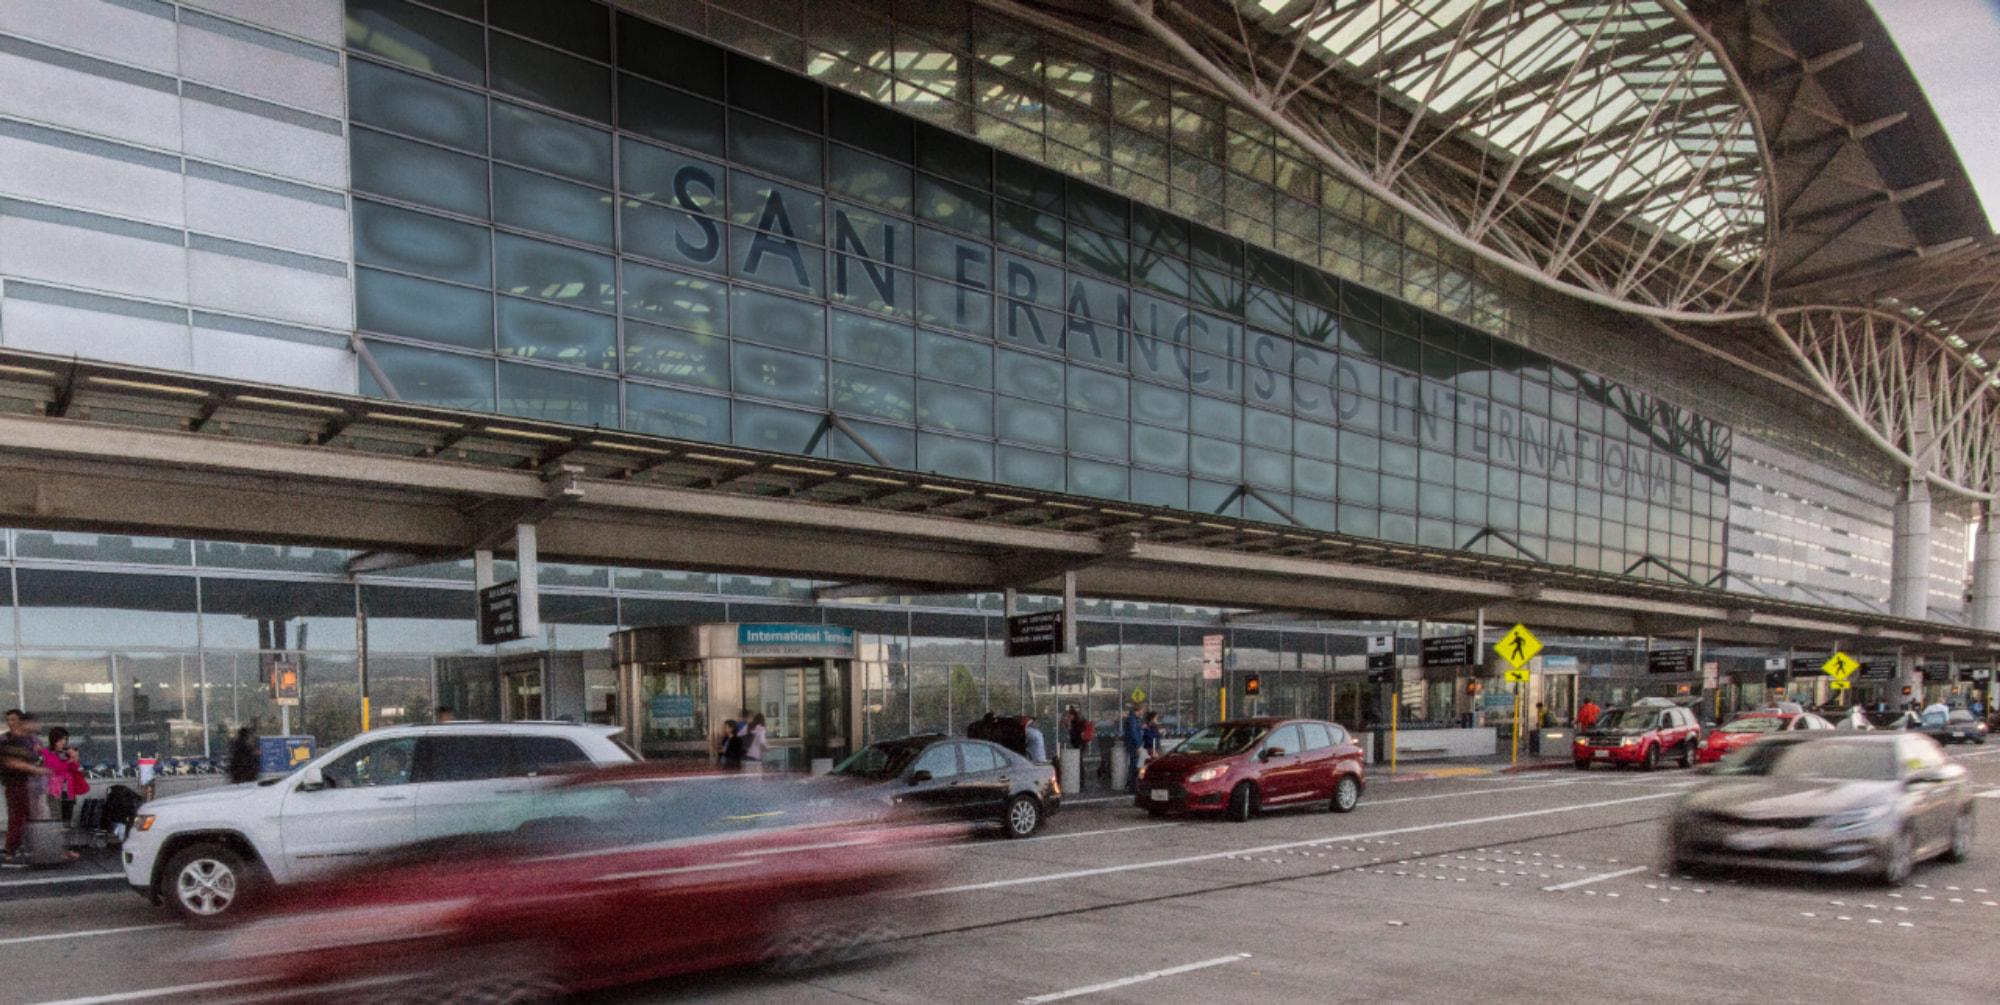 Terminal Maps San Francisco International Airport